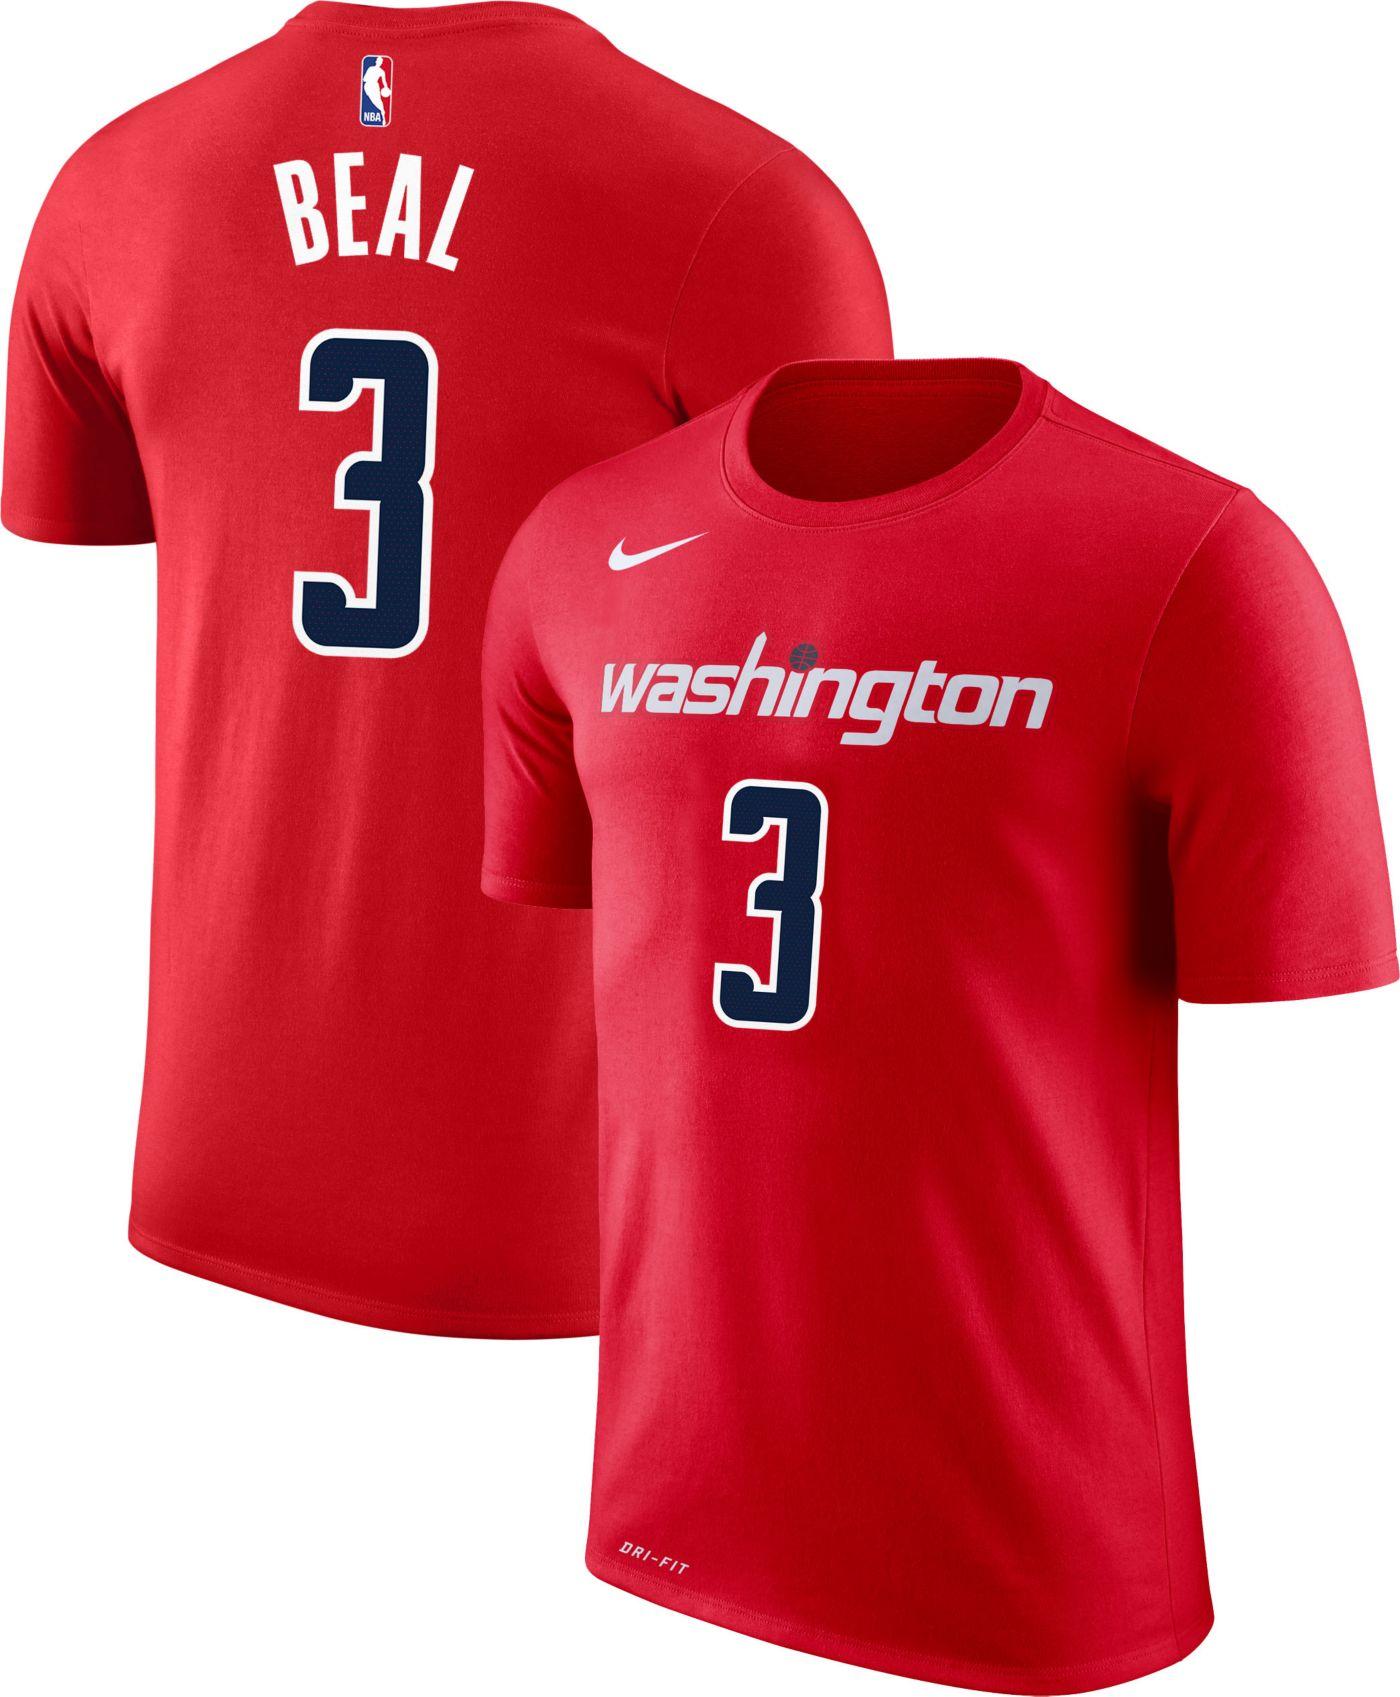 Nike Youth Washington Wizards Bradley Beal #3 Dri-FIT Red T-Shirt